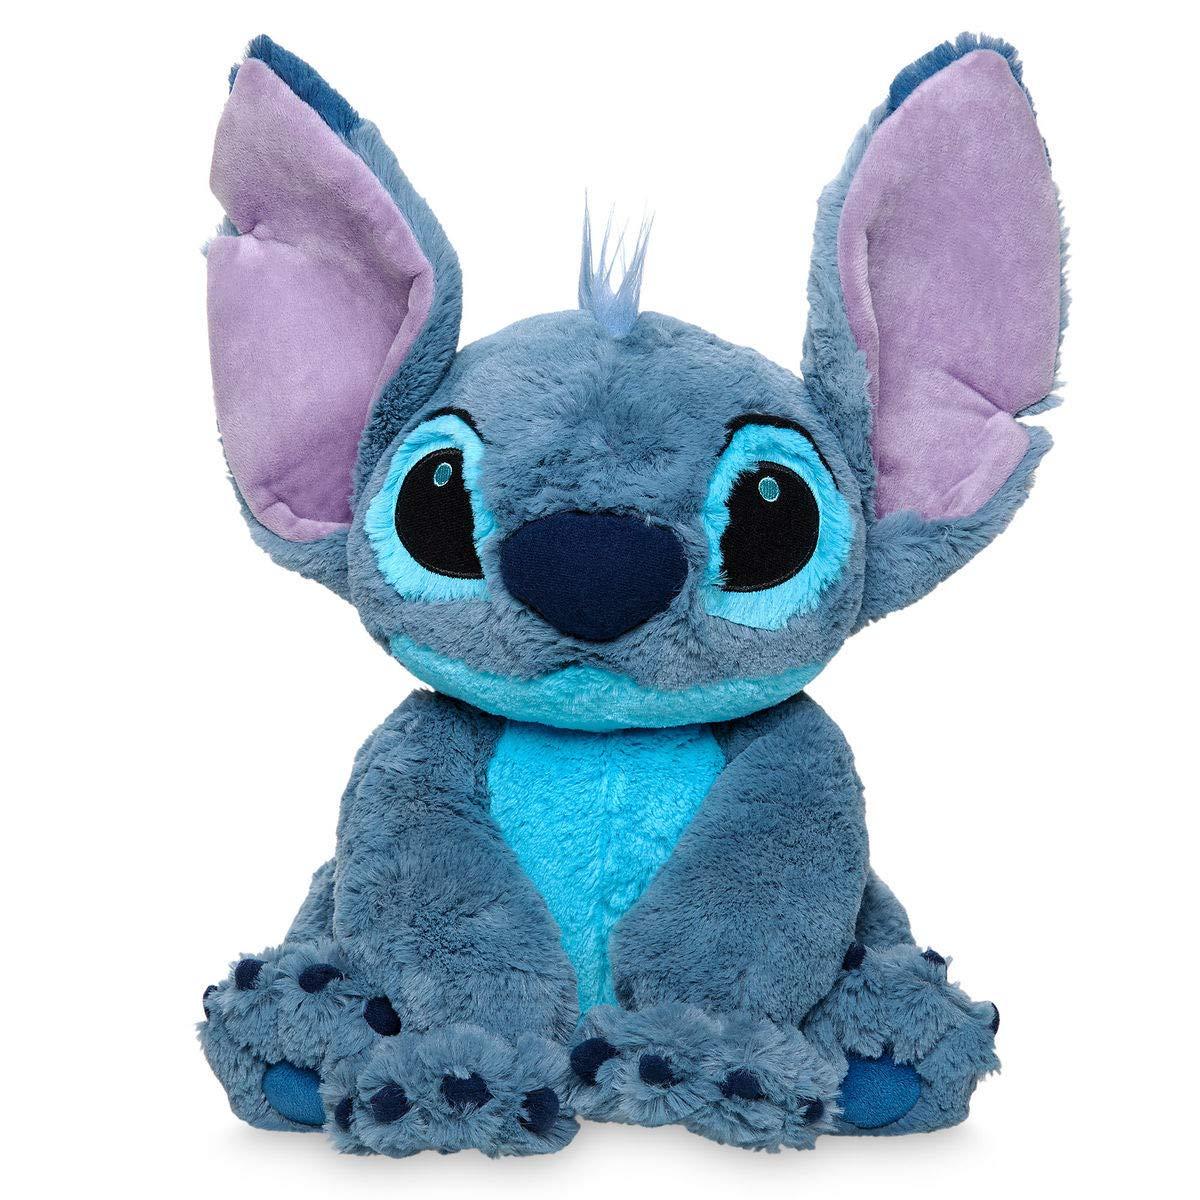 Disney New Store Stitch Plush Doll - Lilo & Stitch - Medium 15 Inch Disney Store